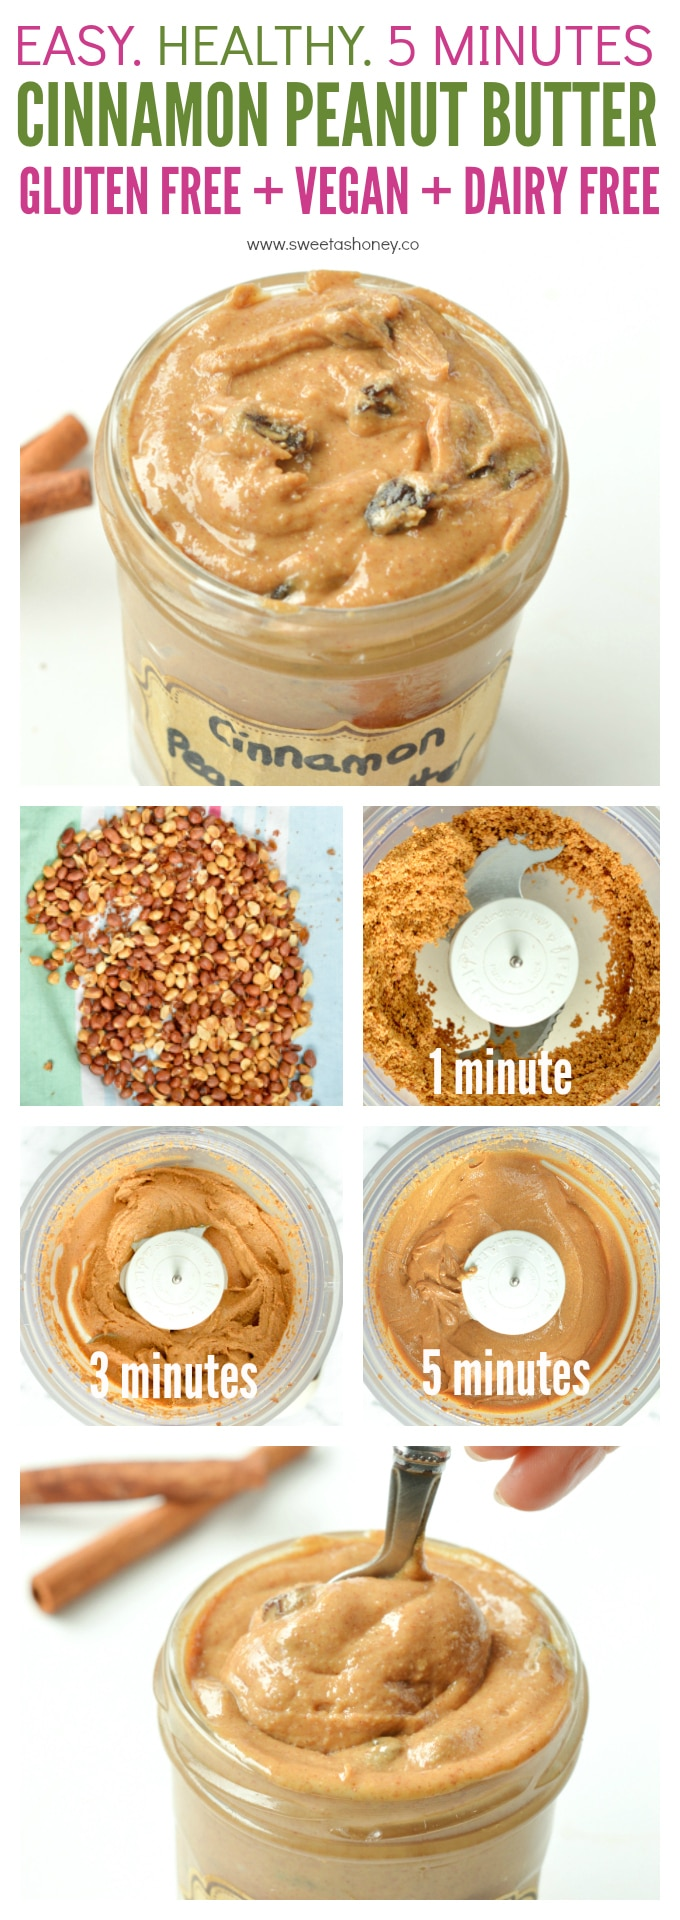 Cinnamon Peanut Butter